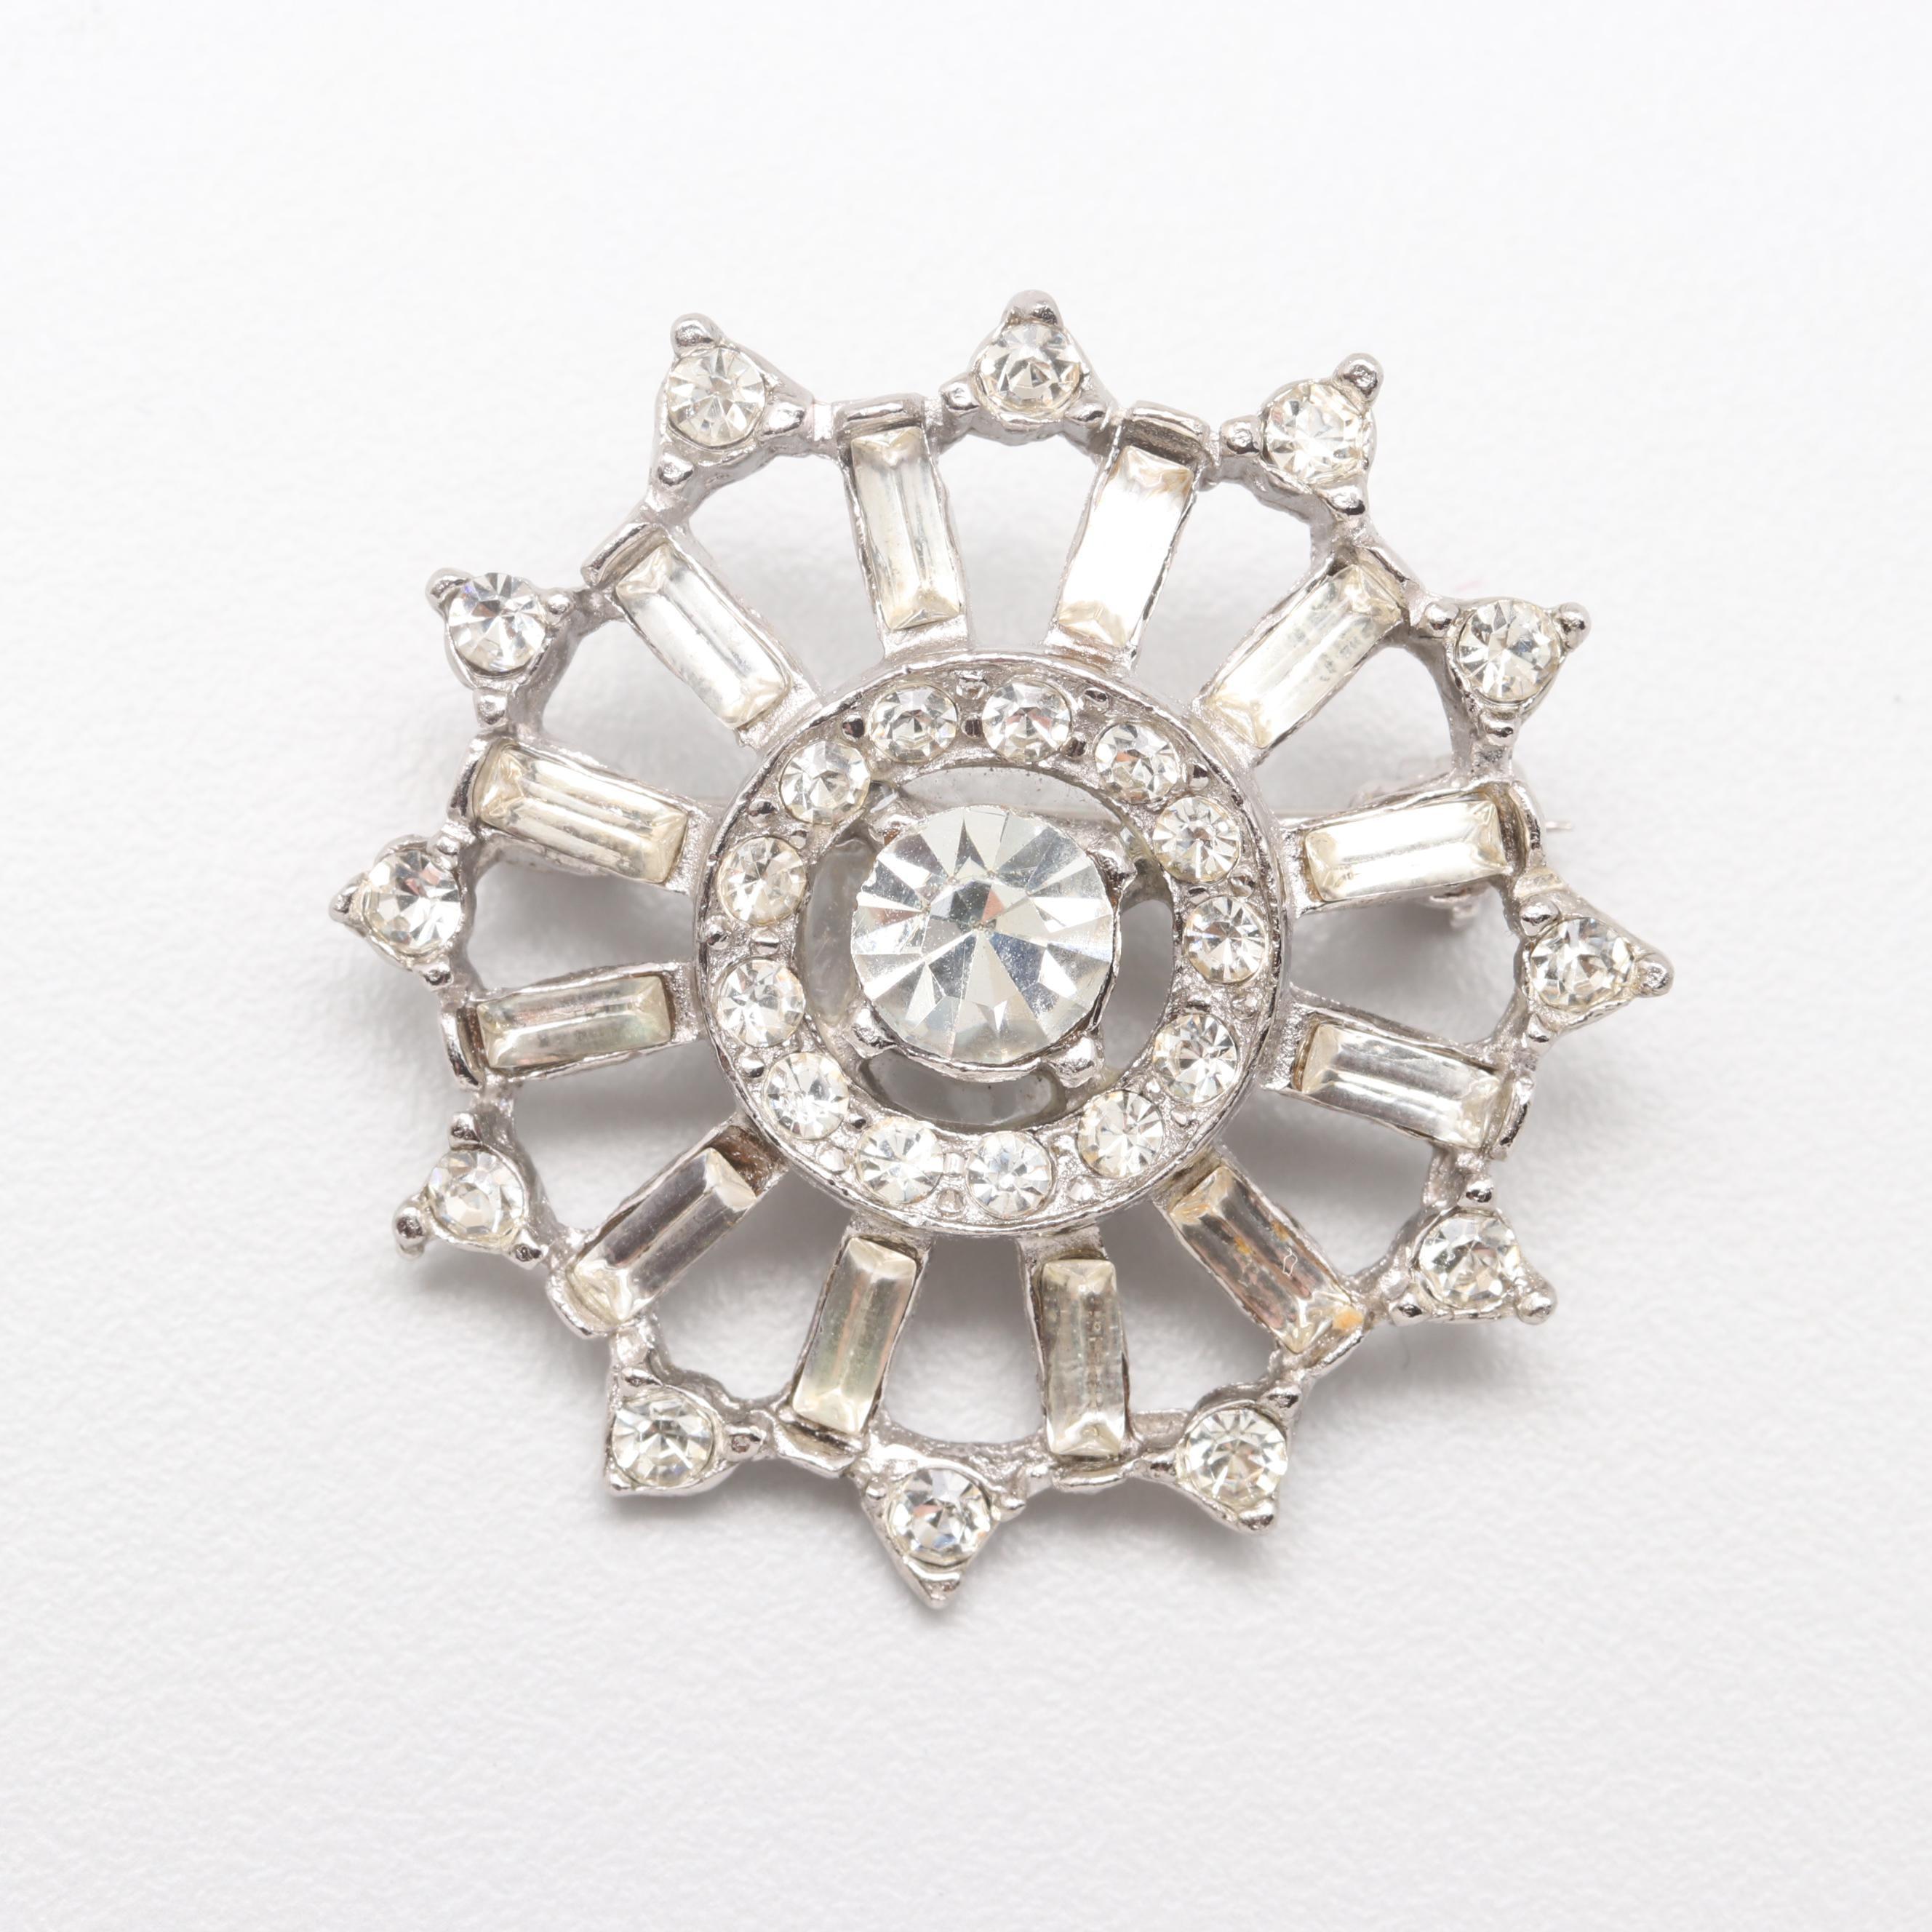 Silver Tone Glass Crystal Brooch